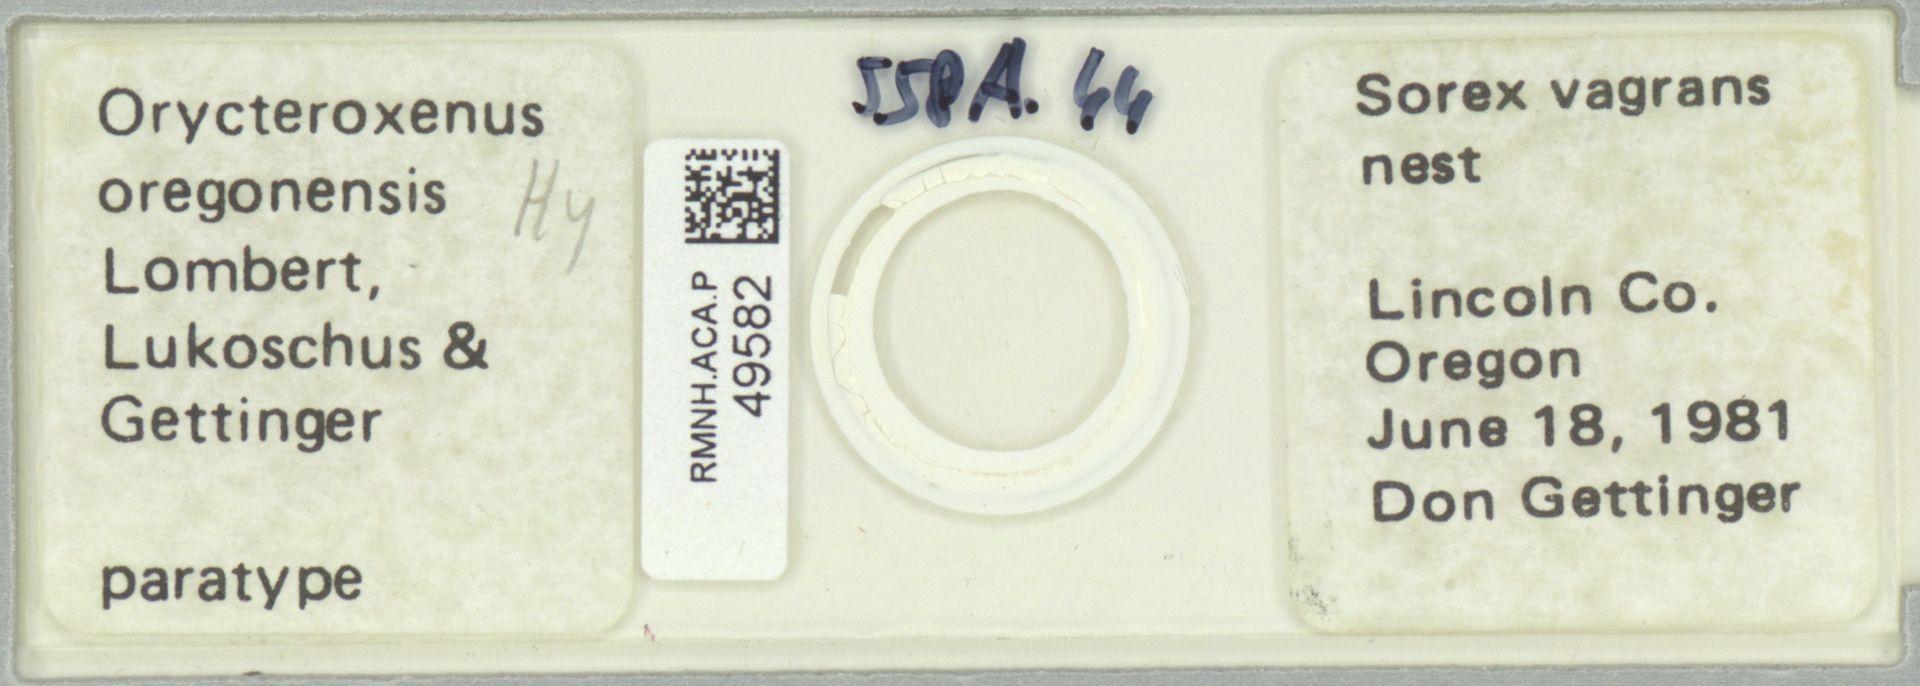 RMNH.ACA.P.49582 | Orycteroxenus oregonensis Lombert, Lukoschus & Gettinger